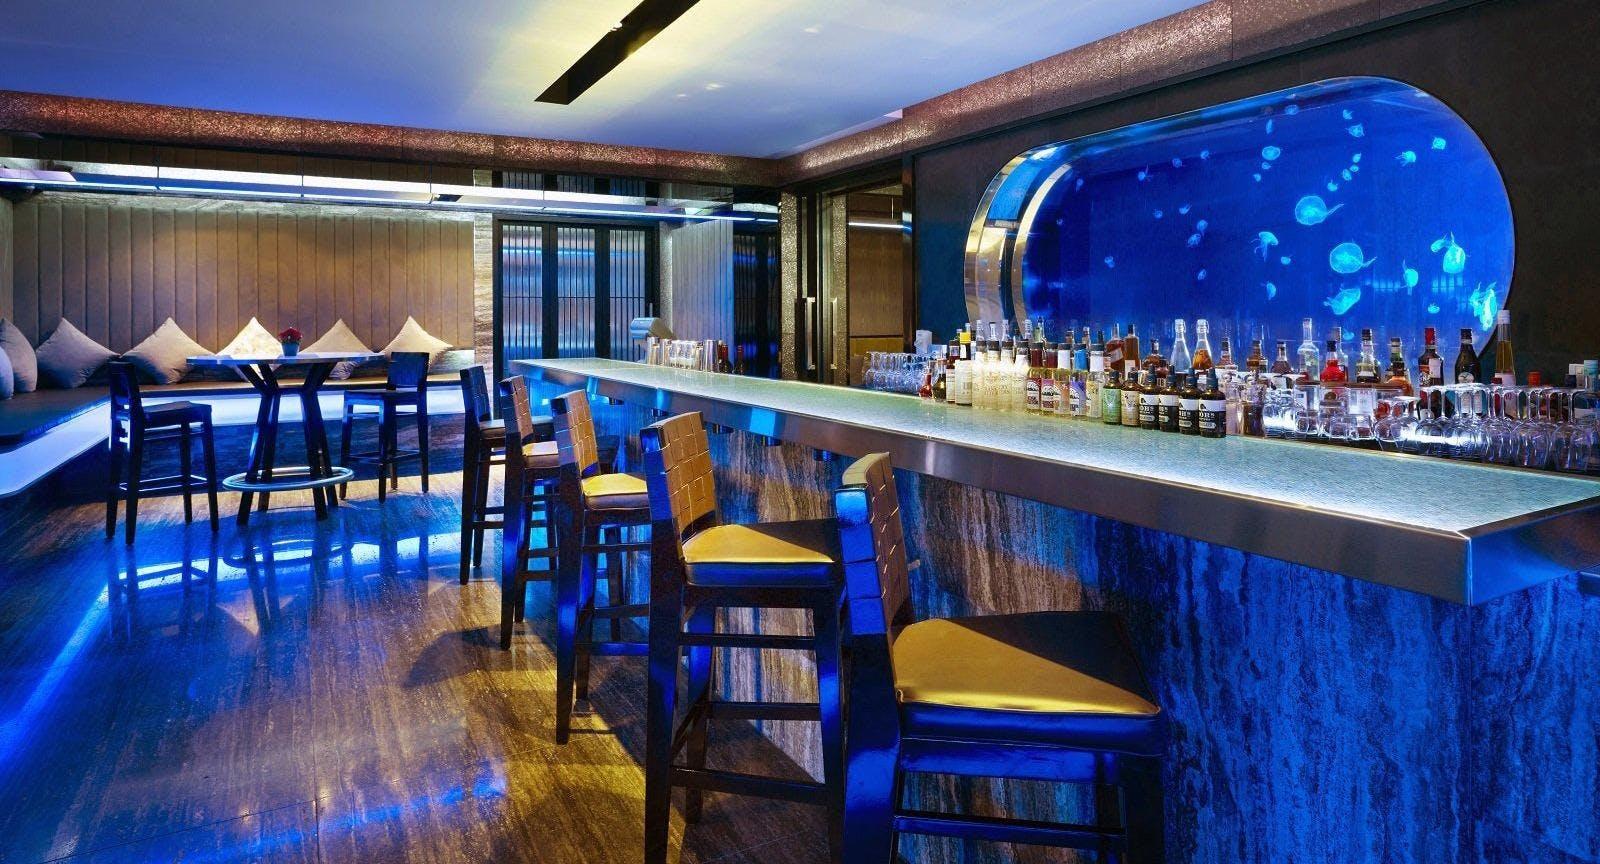 Mitzo Restaurant & Bar